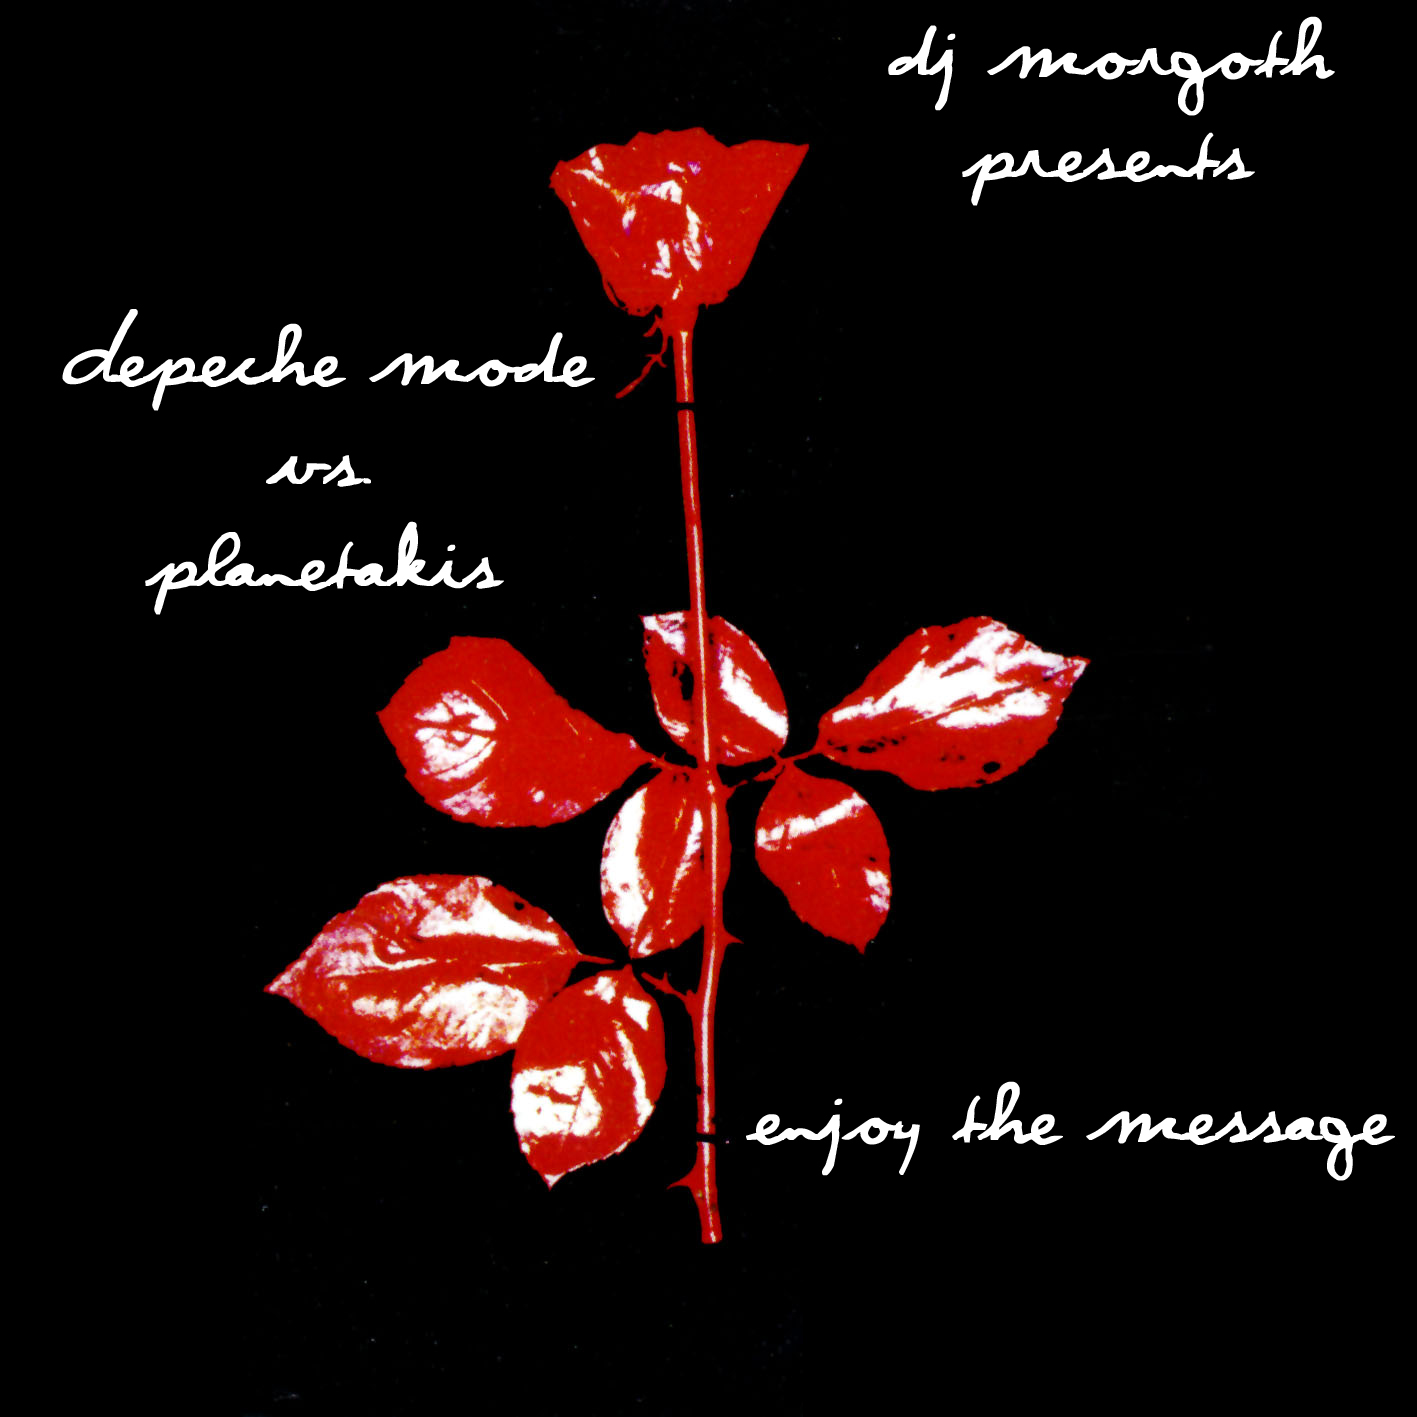 Art for Enjoy The Message  [Depeche Mode vs. Planetakis] by DJ Morgoth